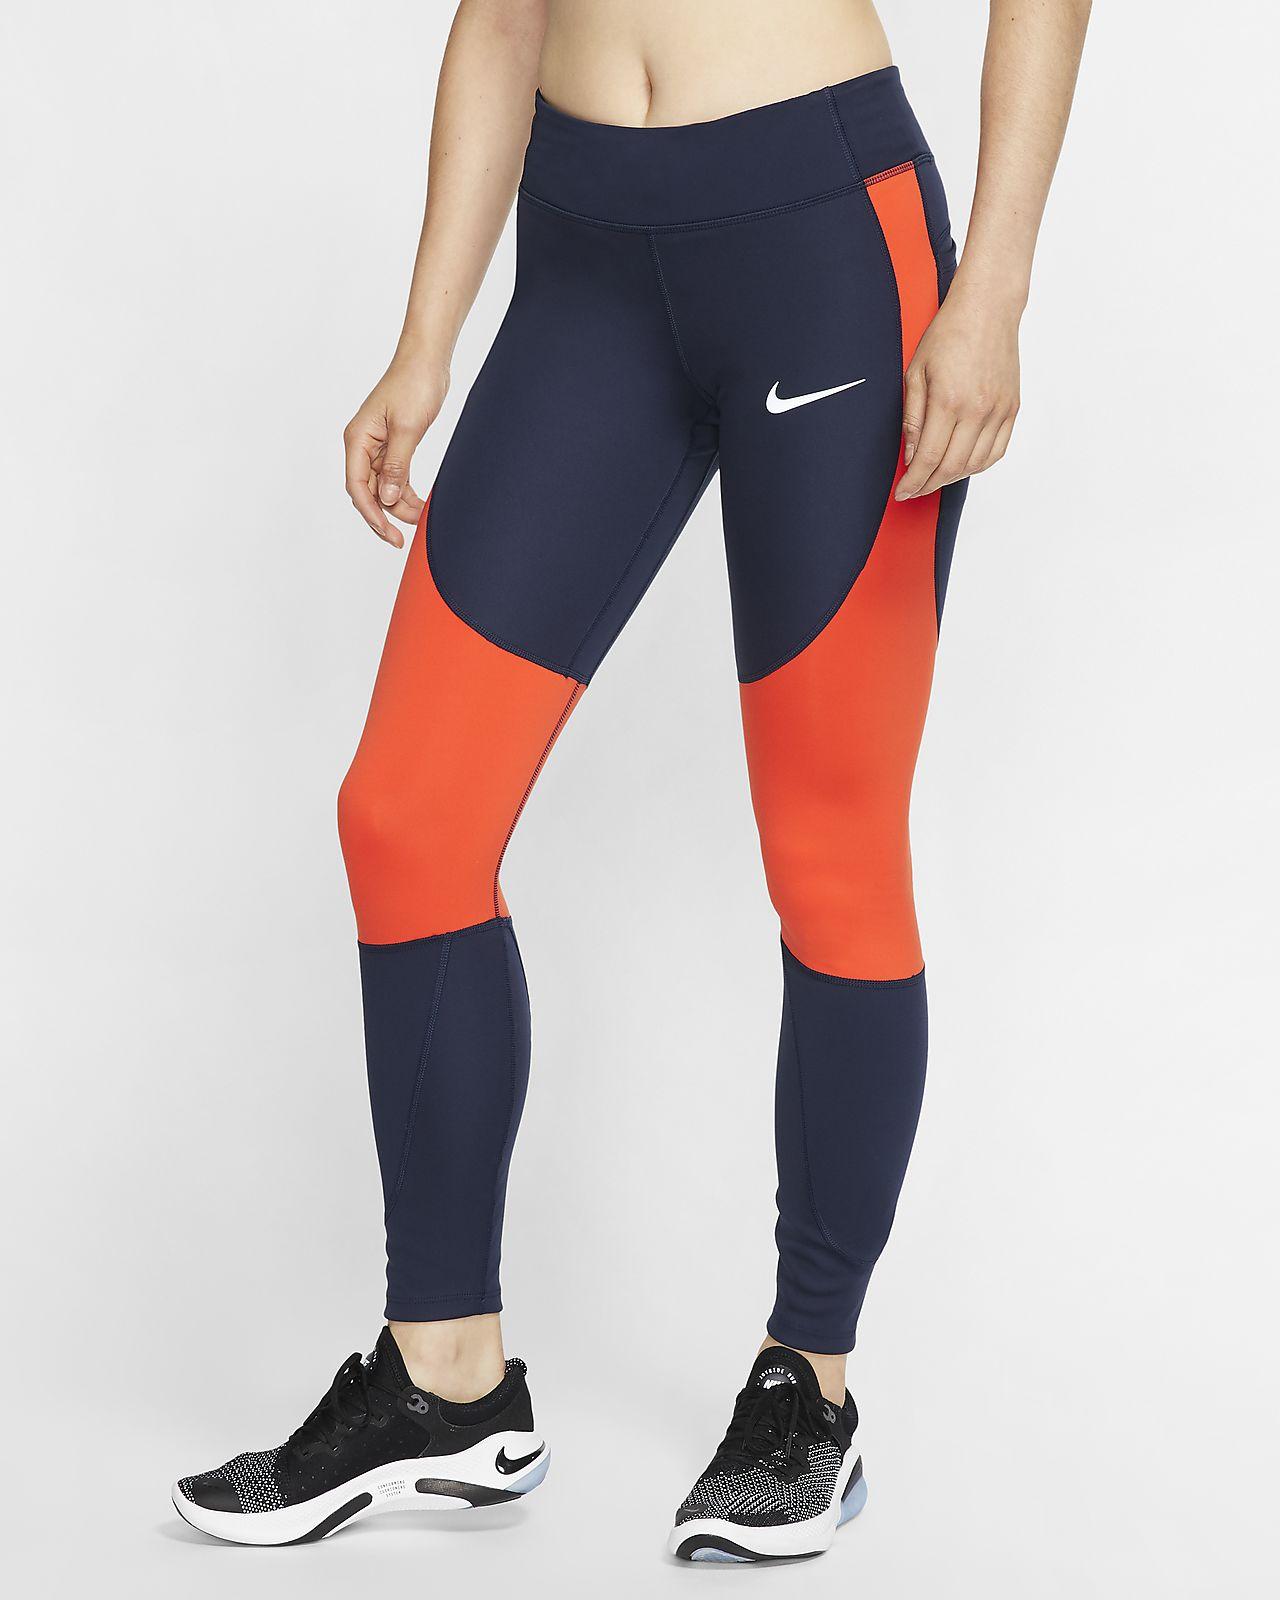 Mallas de running para mujer Nike Epic Lux Repel